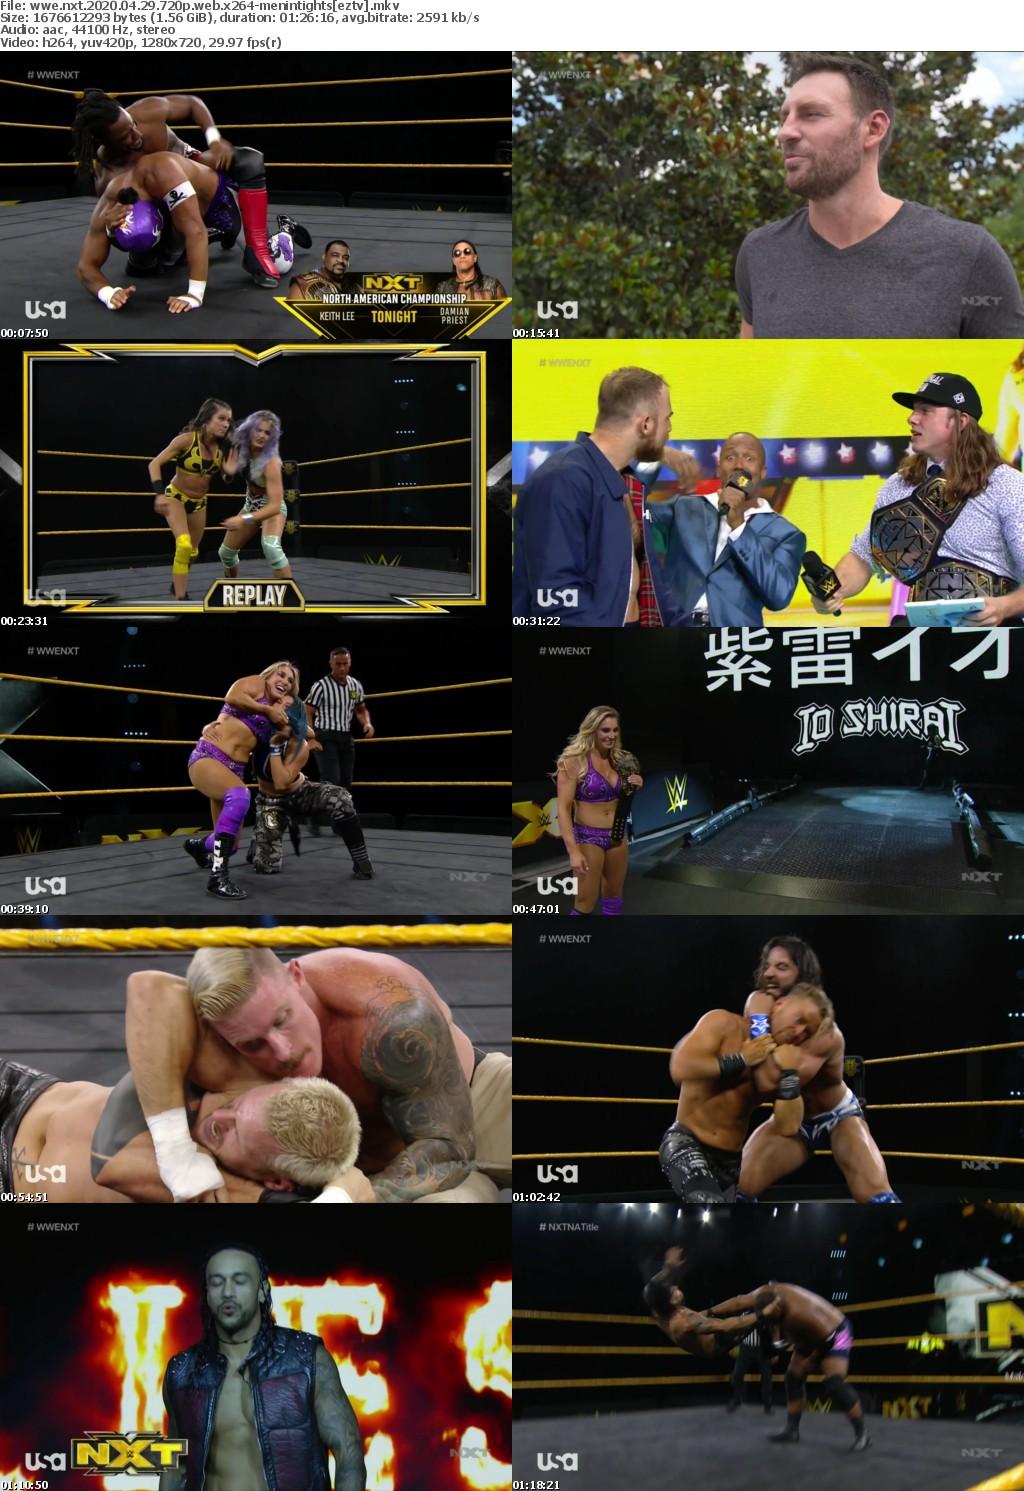 WWE NXT 2020 04 29 720p WEB x264-MenInTights